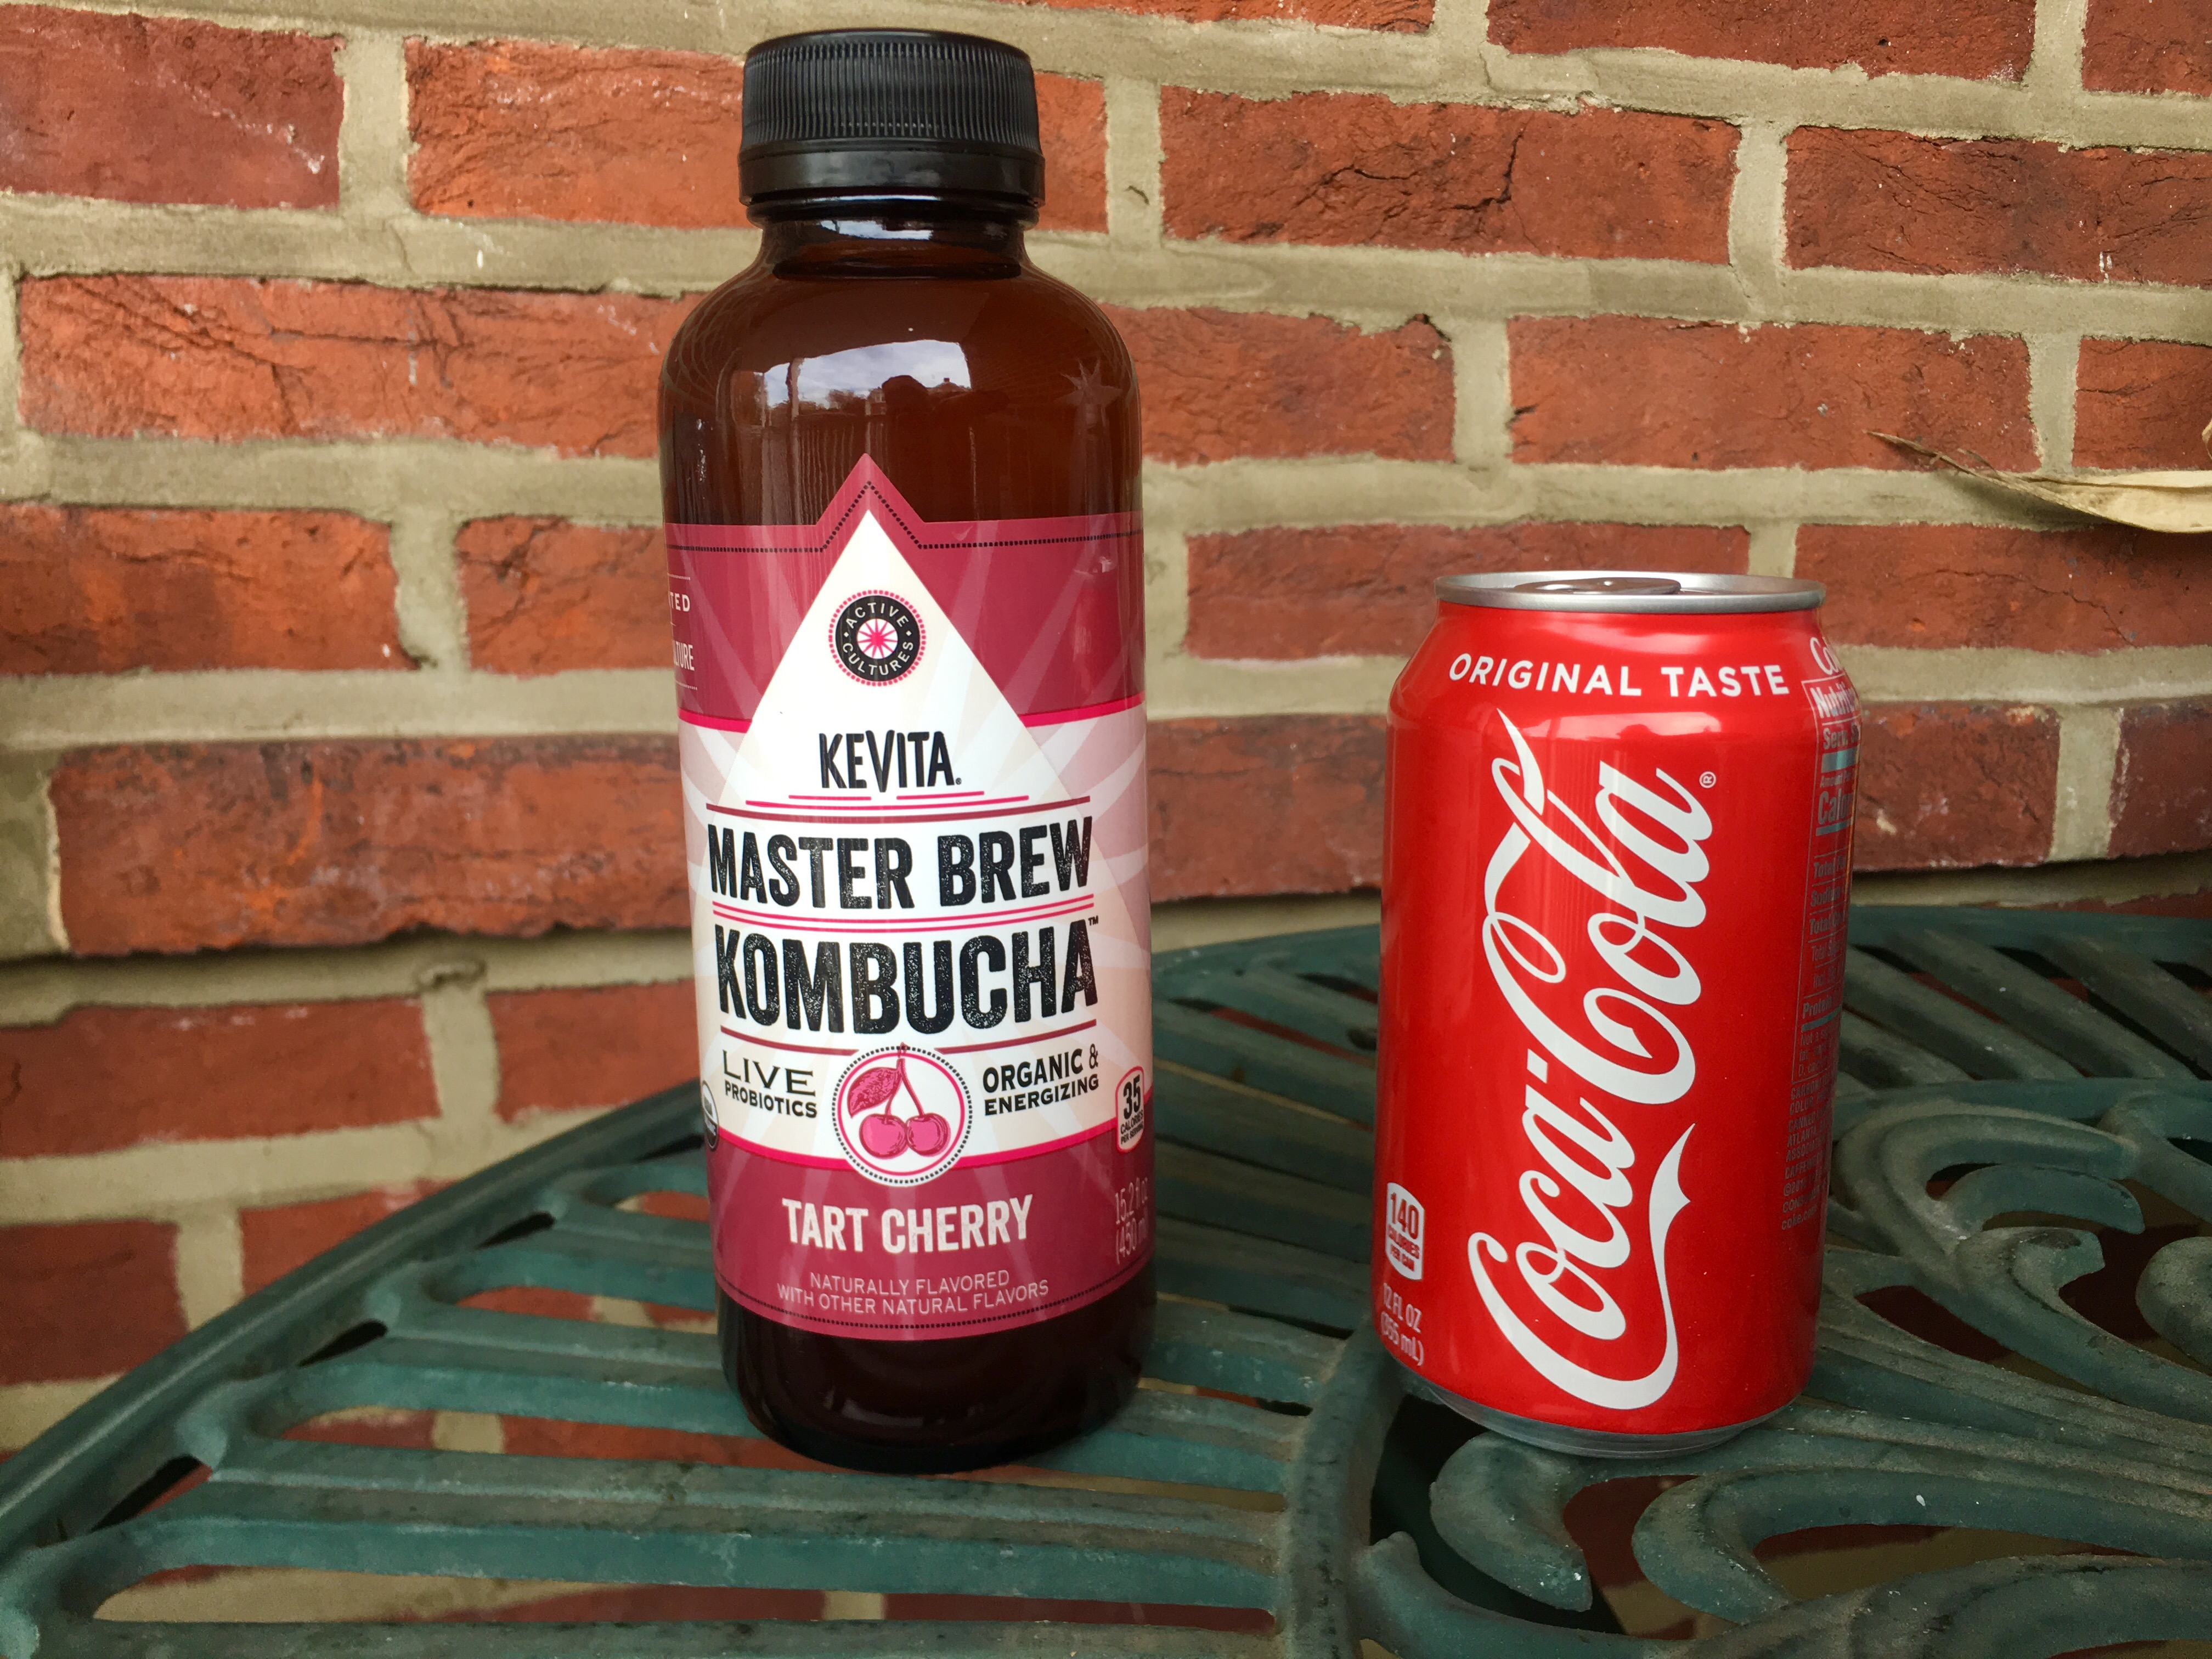 Kombucha bottle next to a can of coke